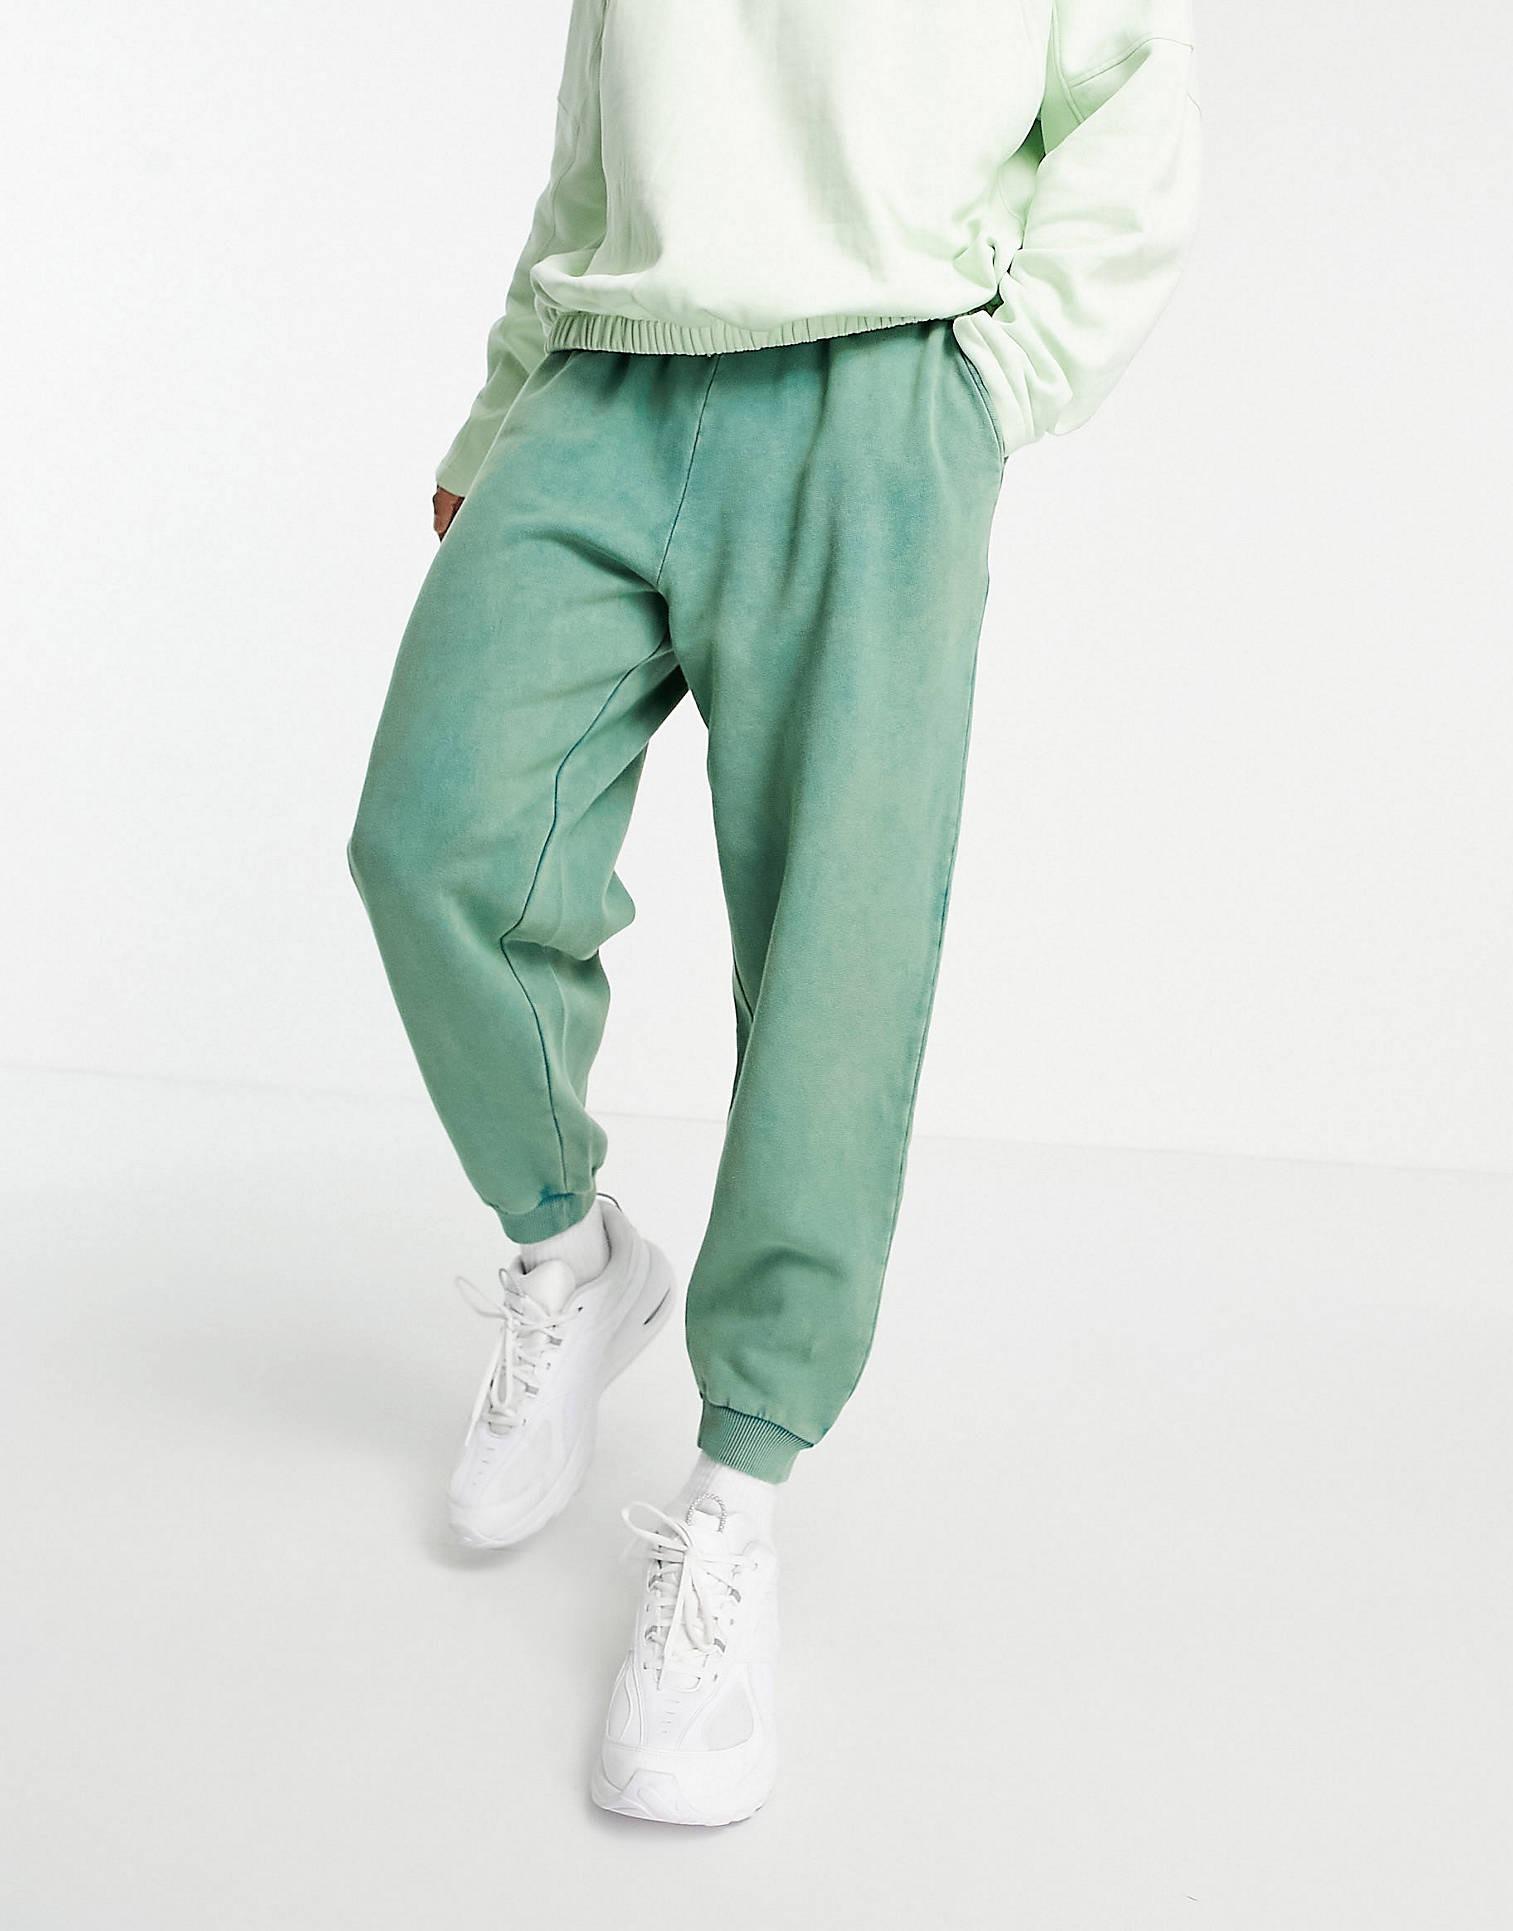 ASOS DESIGN Oversized Sweatpants